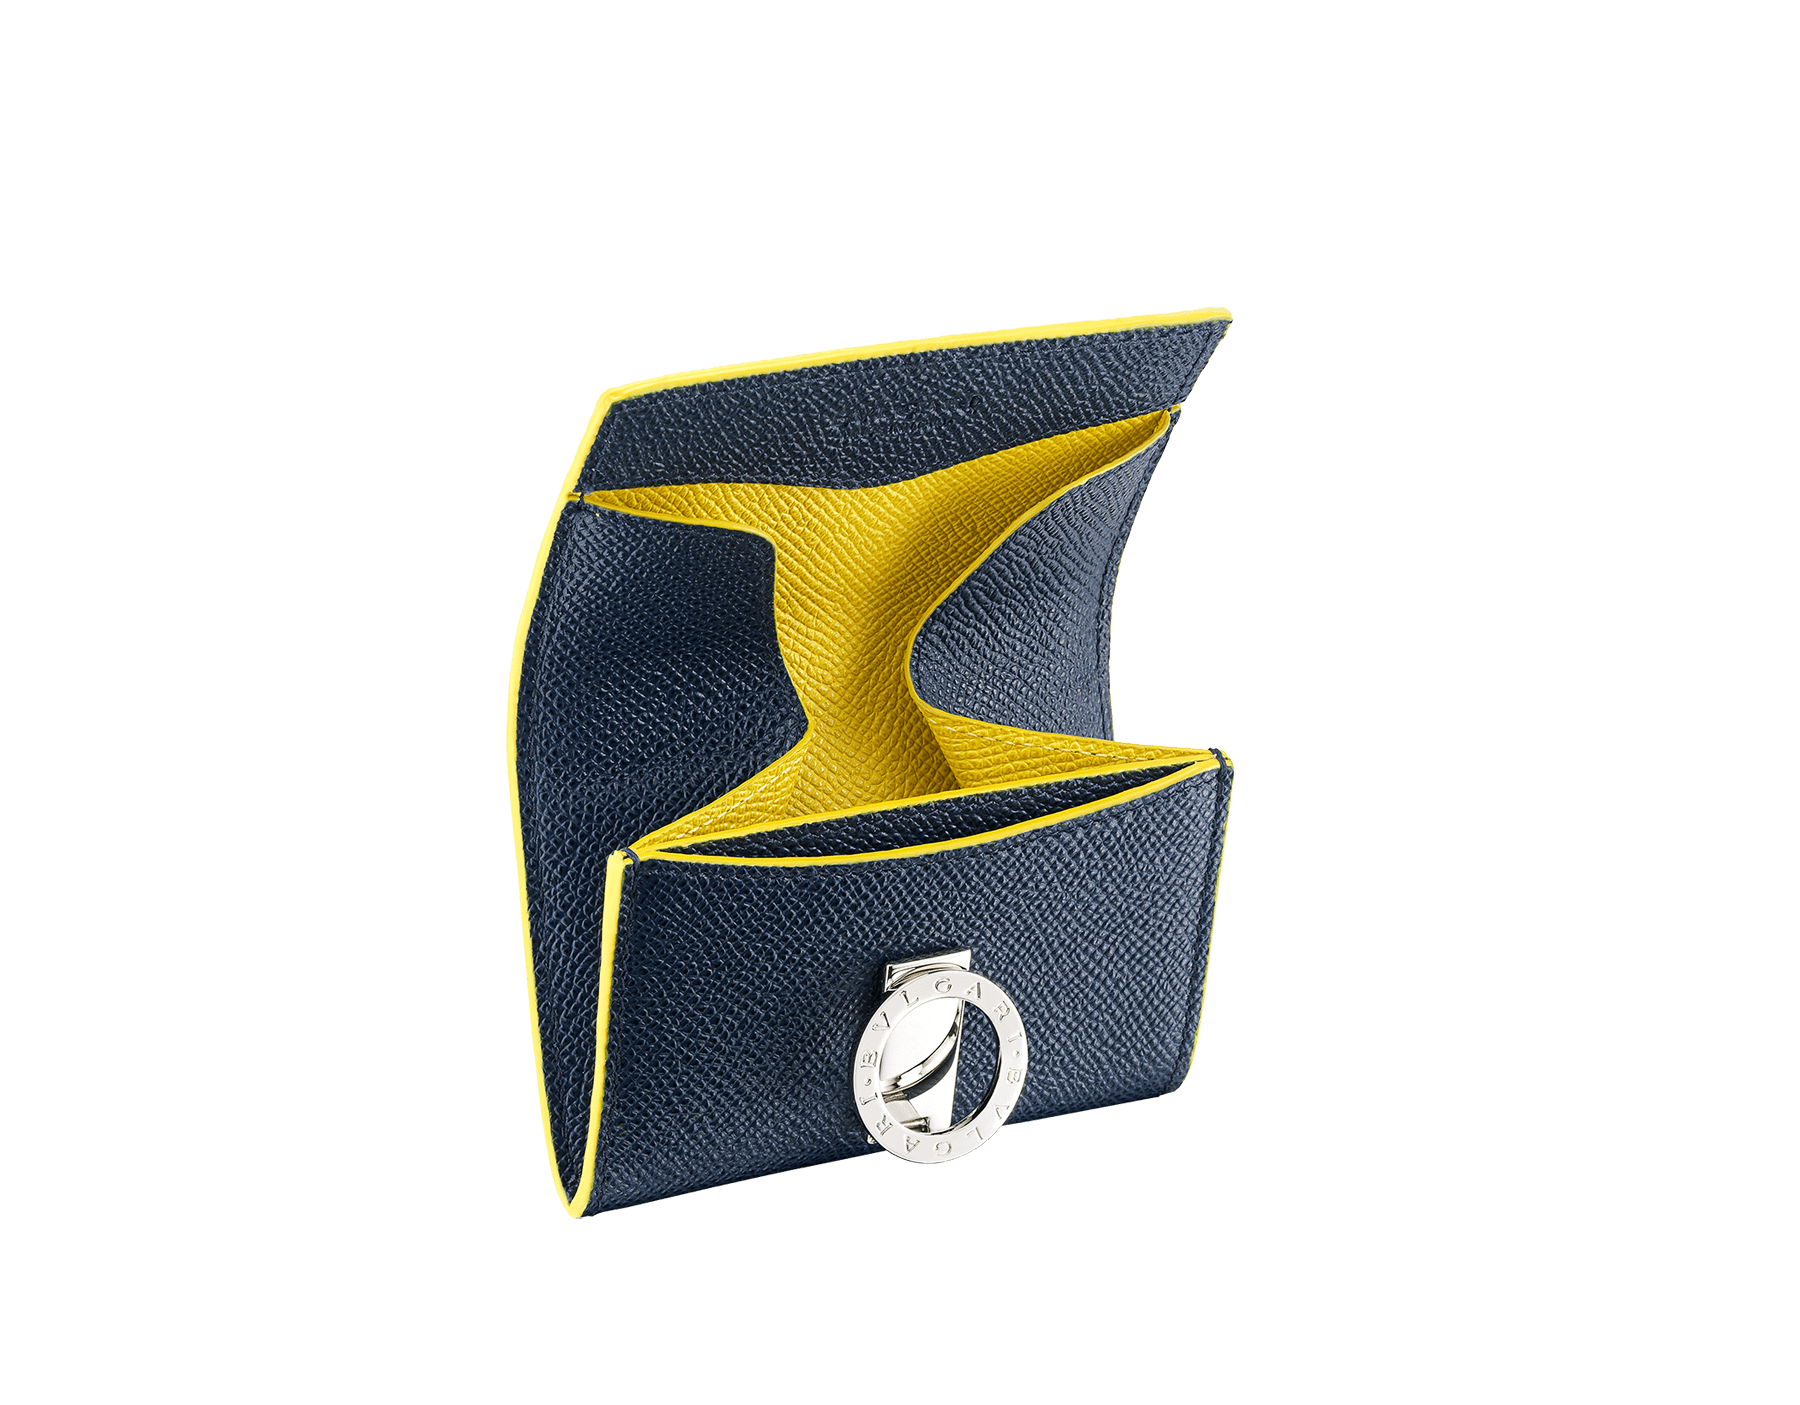 BVLGARI BVLGARI 零錢包,採用綠玉色和火珀色珠面小牛皮。經典鍍釕黃銅品牌標誌扣環。 BCM-WLT-S-RECTb image 2